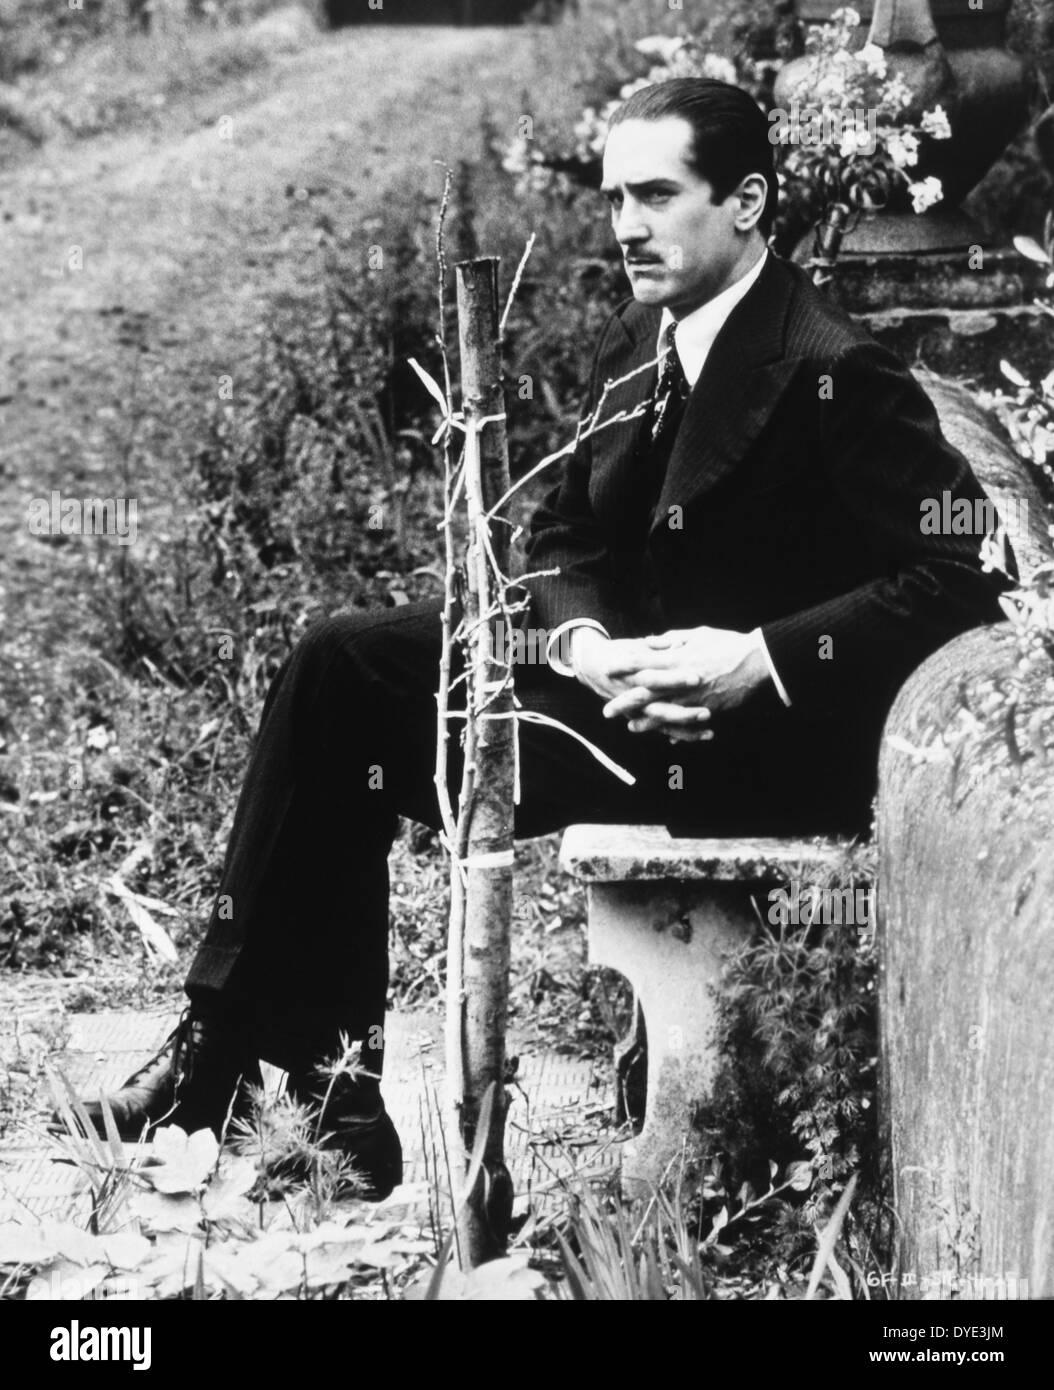 Robert De Niro, on-set of the Film, 'The Godfather Part II', 1974 - Stock Image